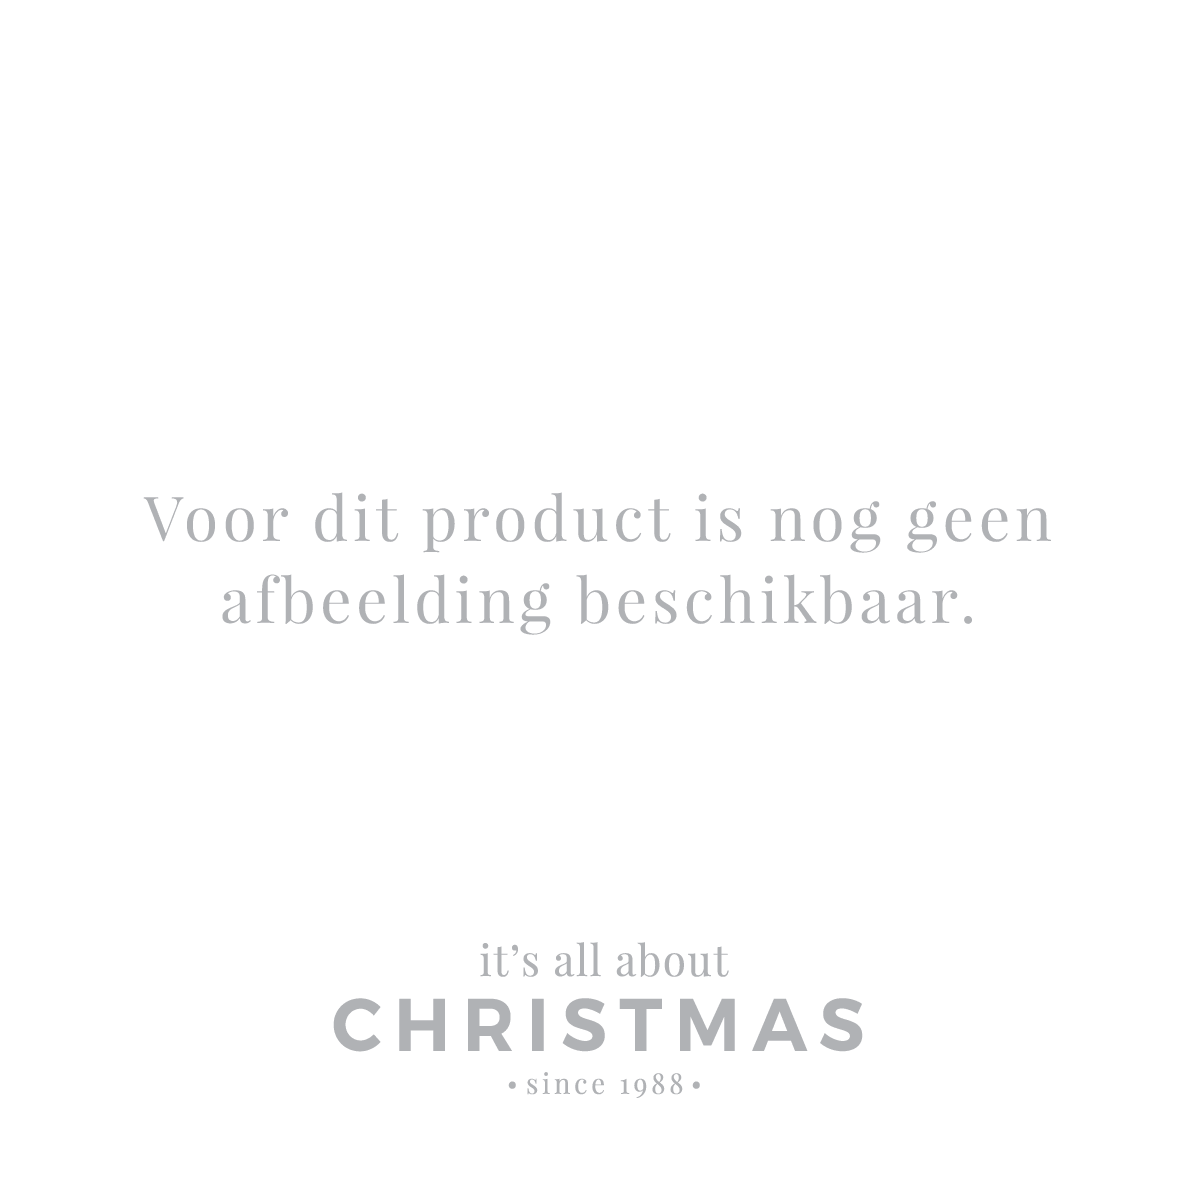 Shatterproof Christmas baubles scandinavian mix 52 pieces